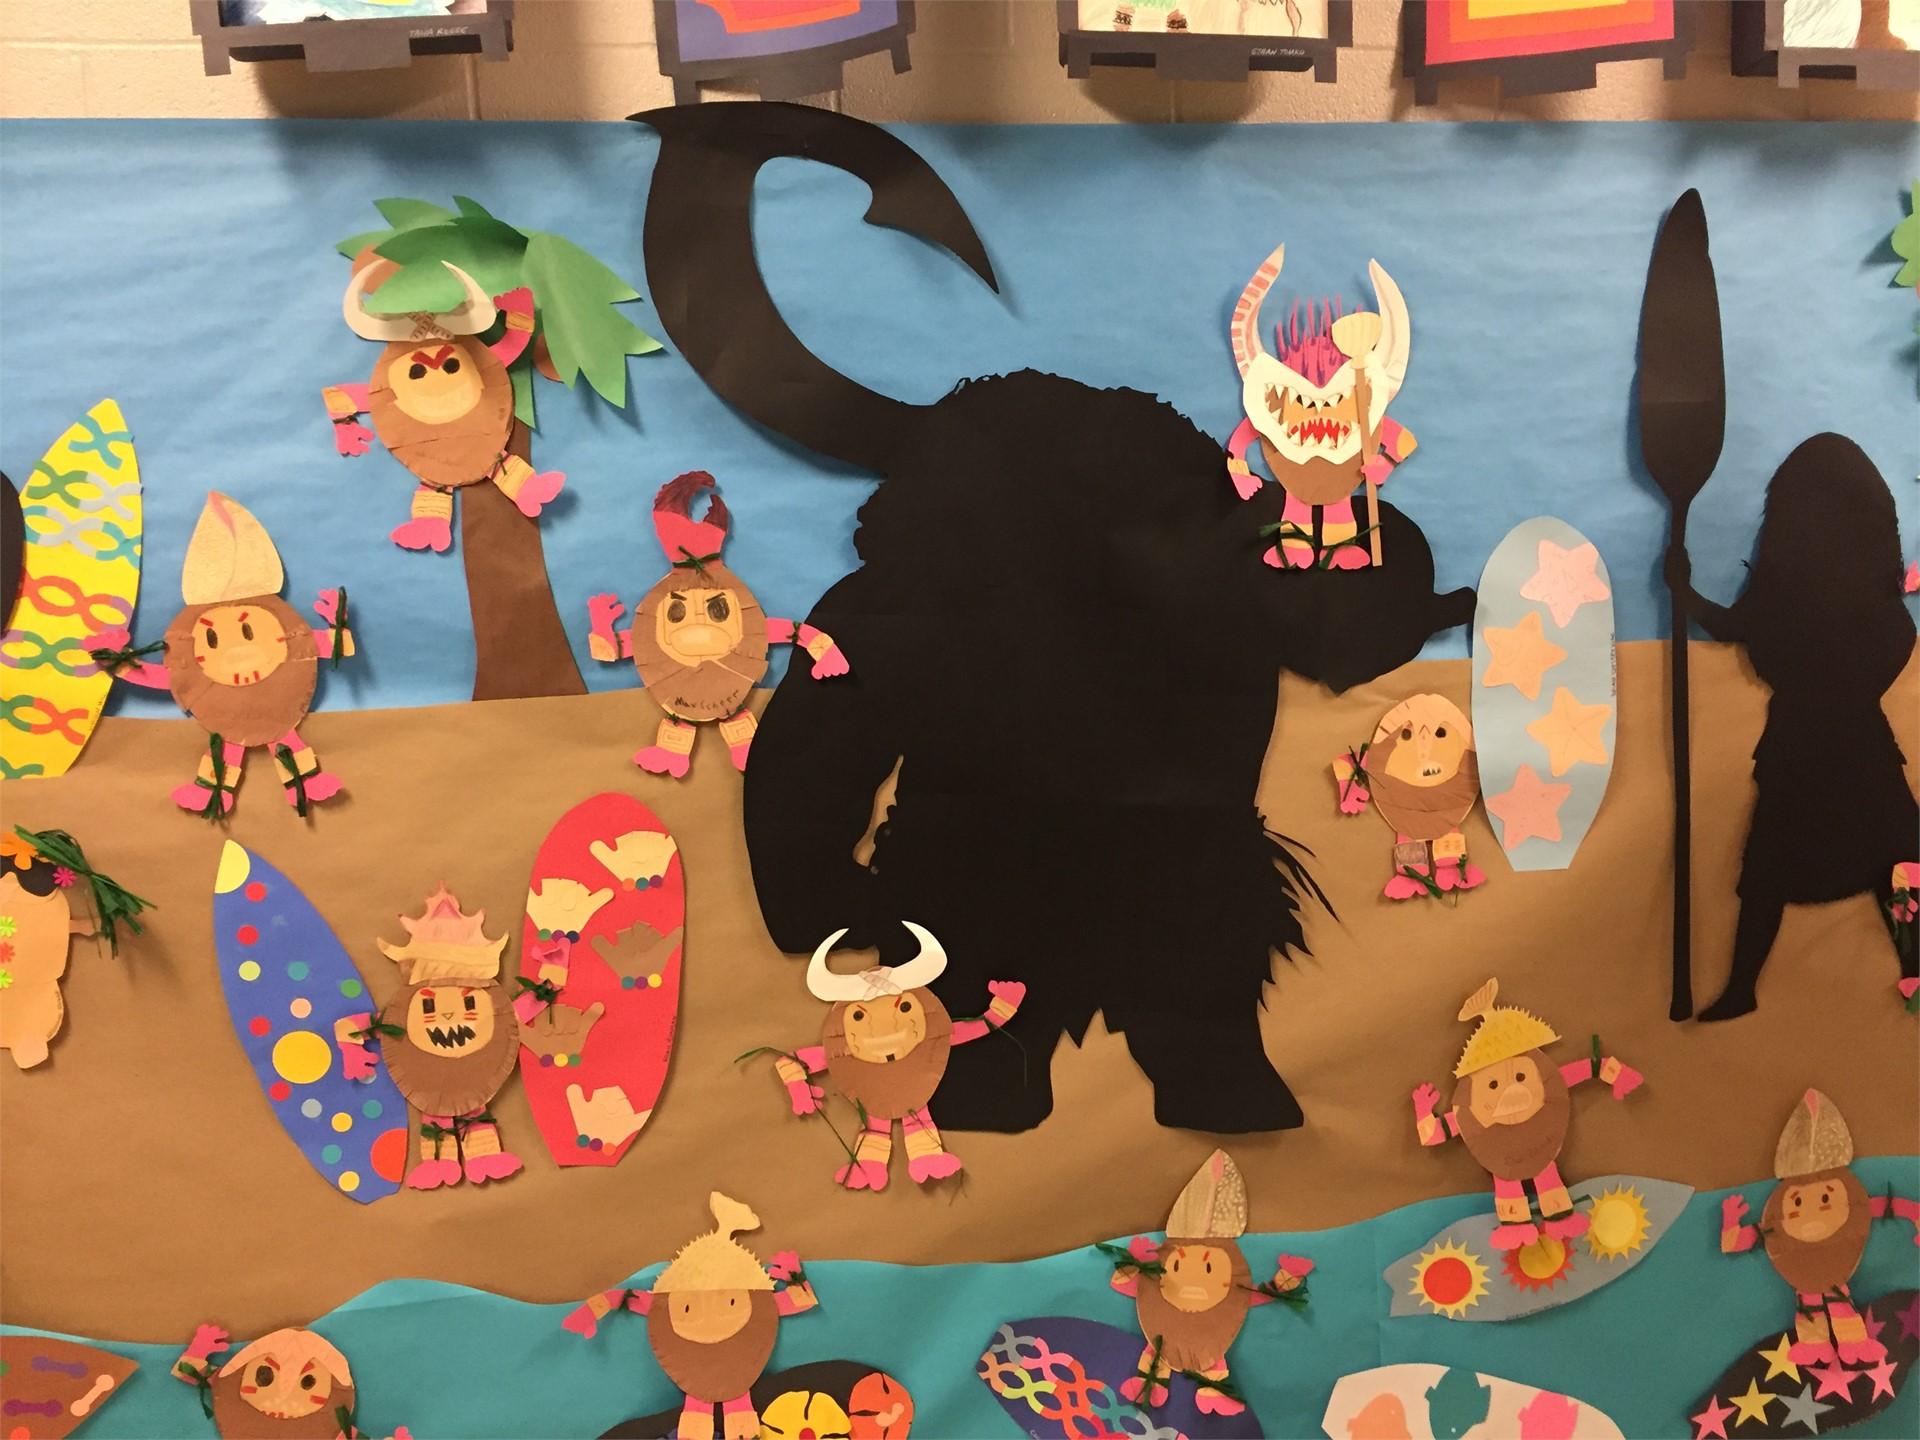 Pivik hallway - Art show